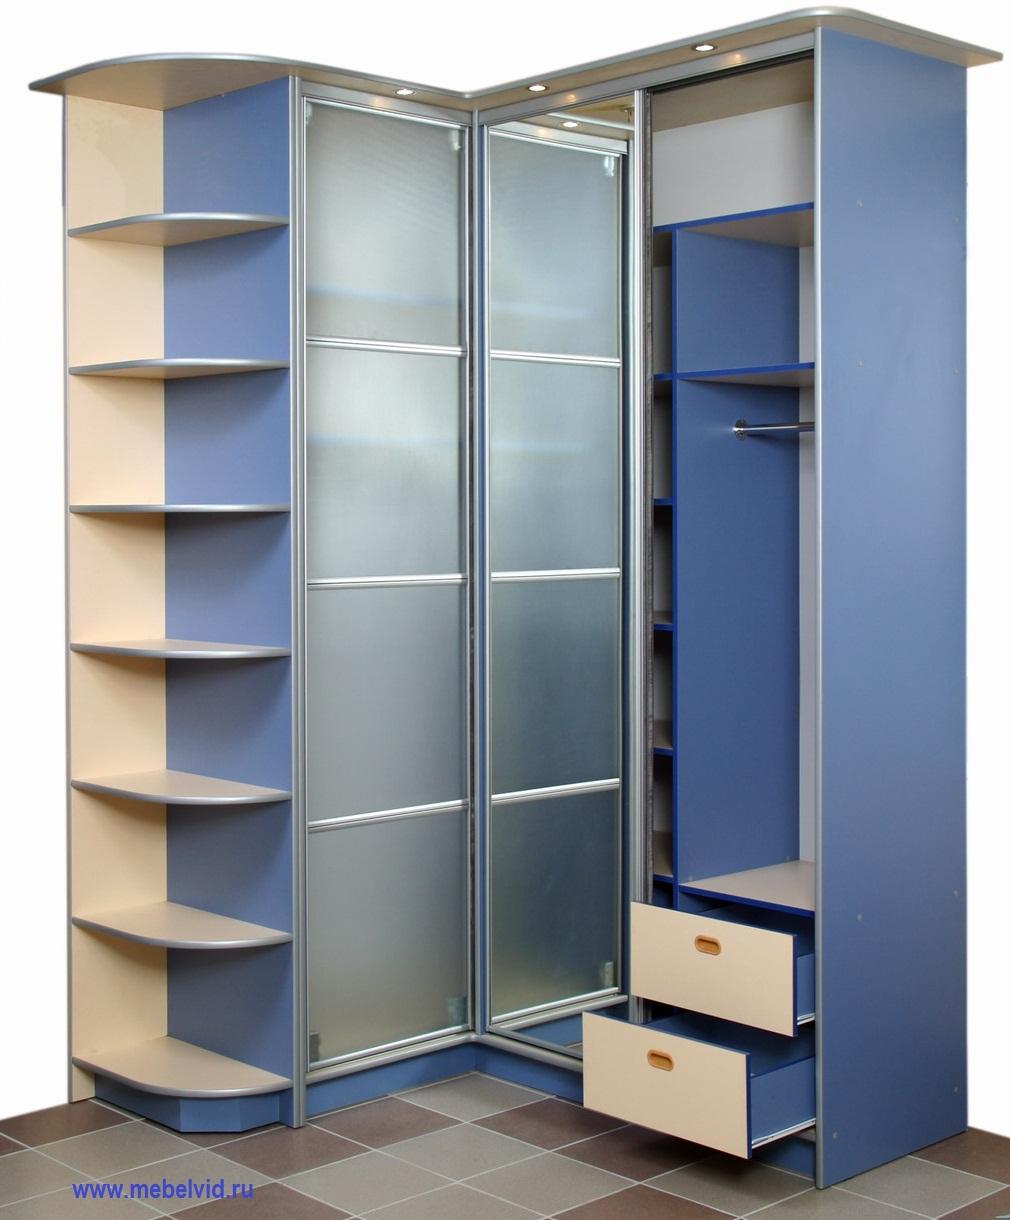 Синий шкаф купе